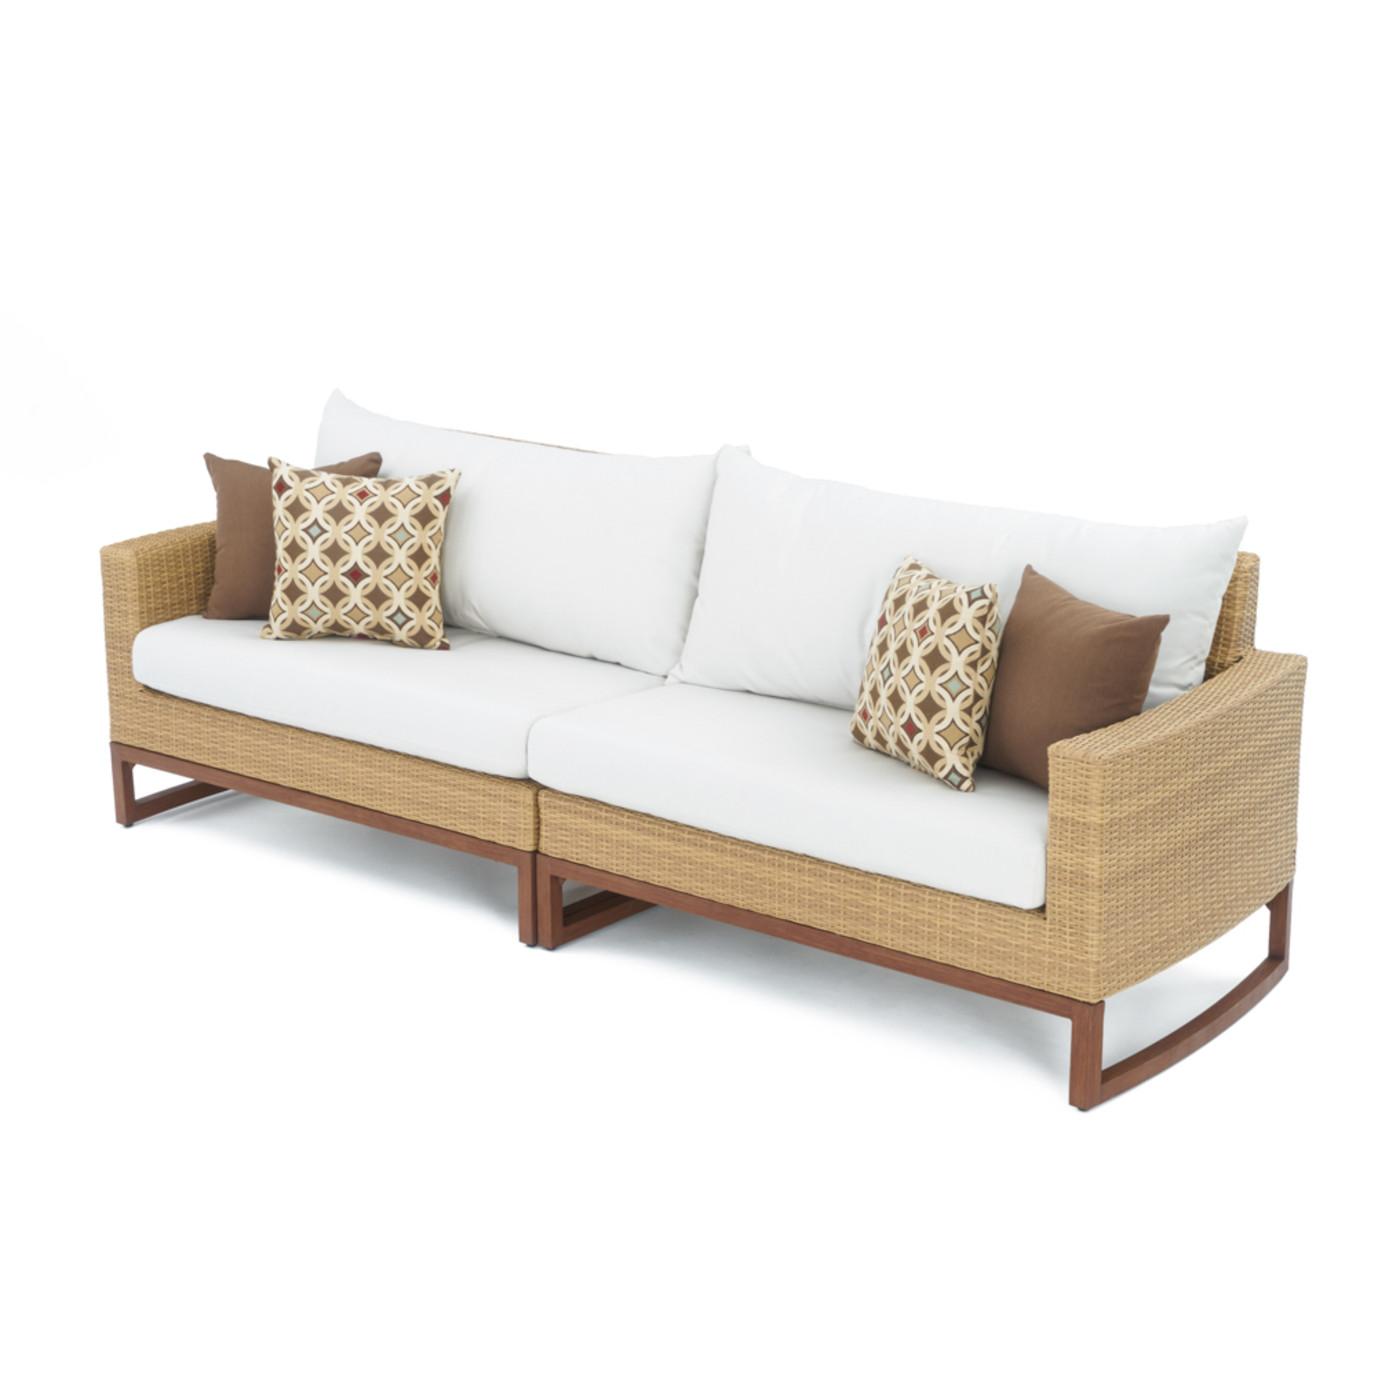 Mili™ 8pc Deep Seating Set - Moroccan Cream